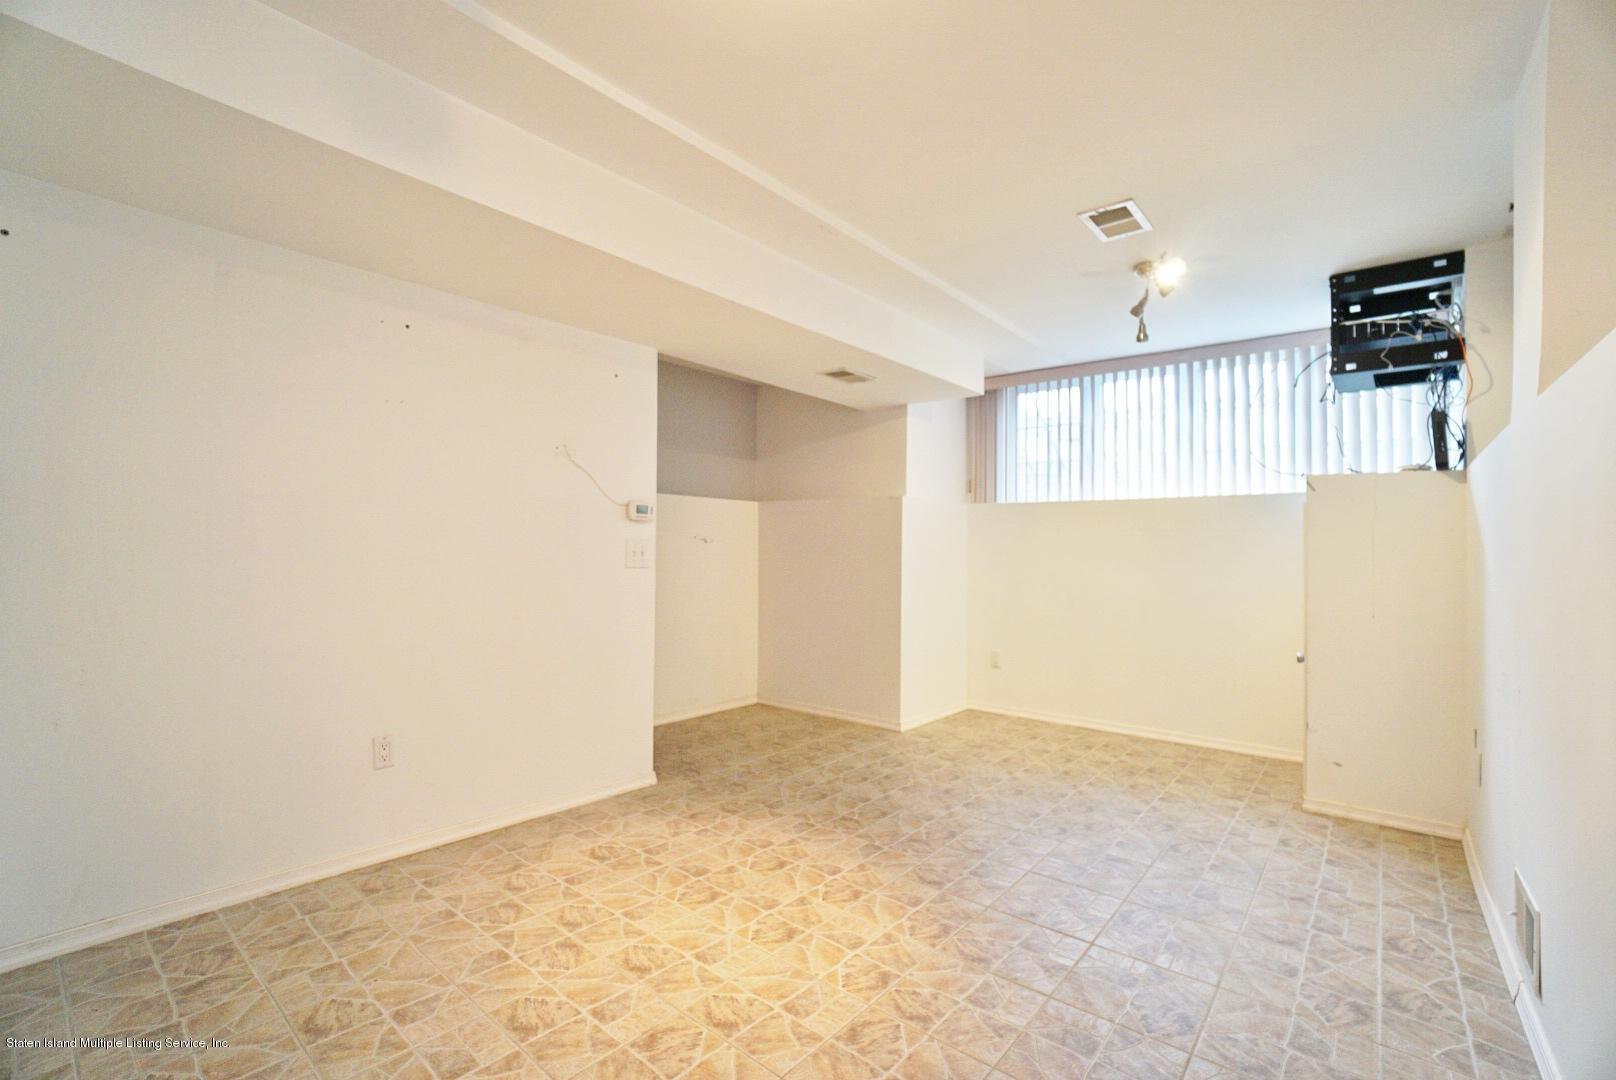 Single Family - Detached 311 Norway Avenue  Staten Island, NY 10305, MLS-1132870-21